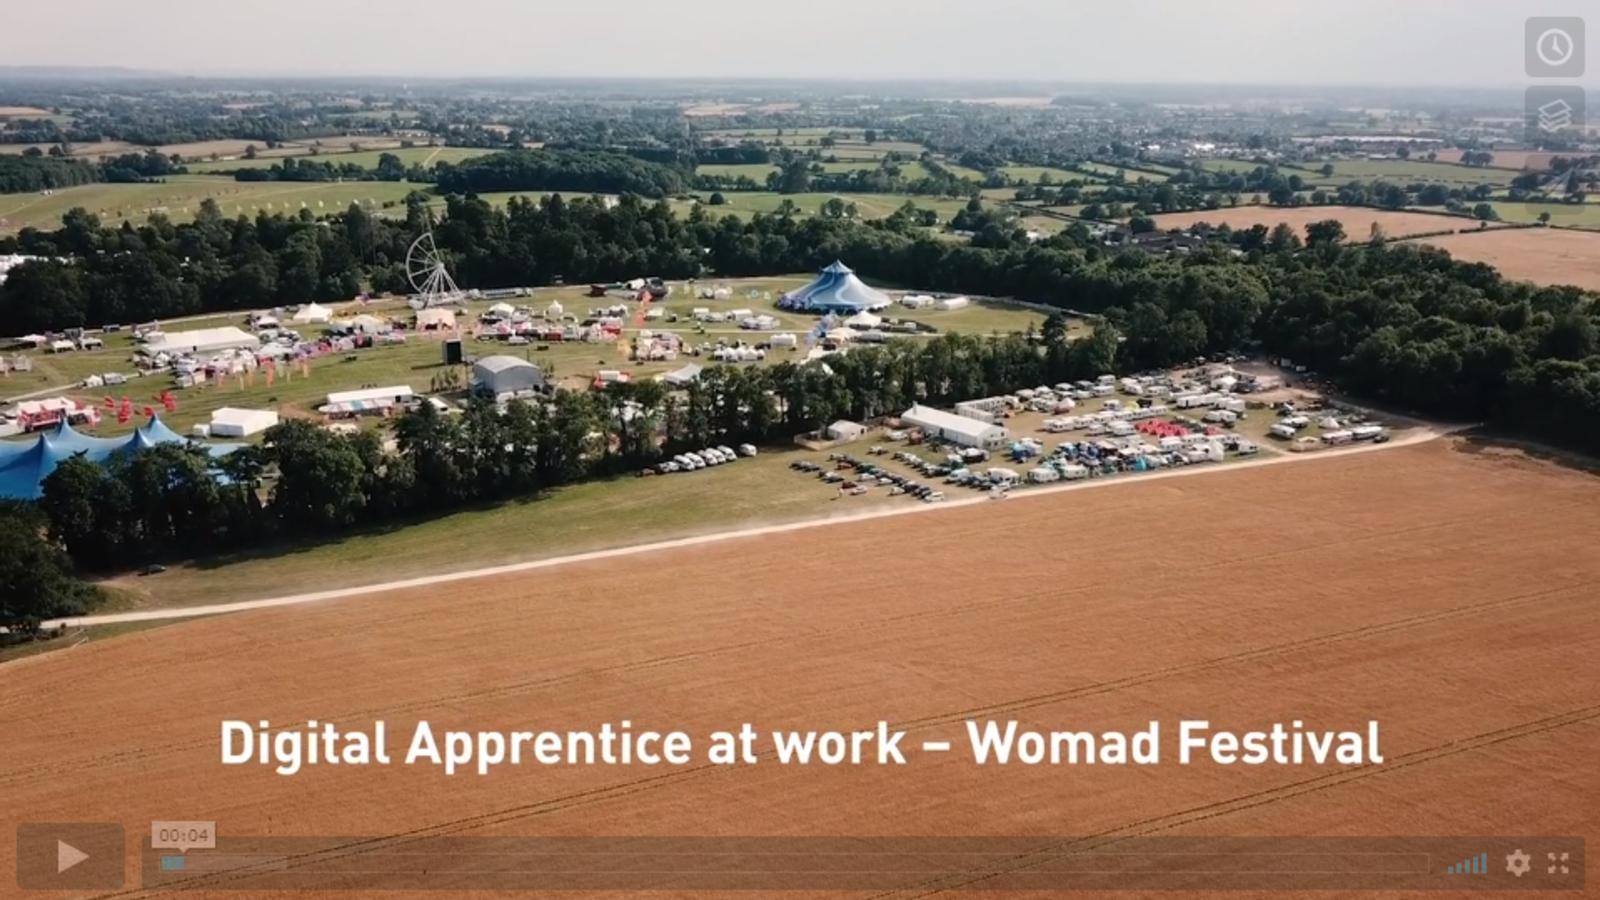 Womad Festival Digital apprentice